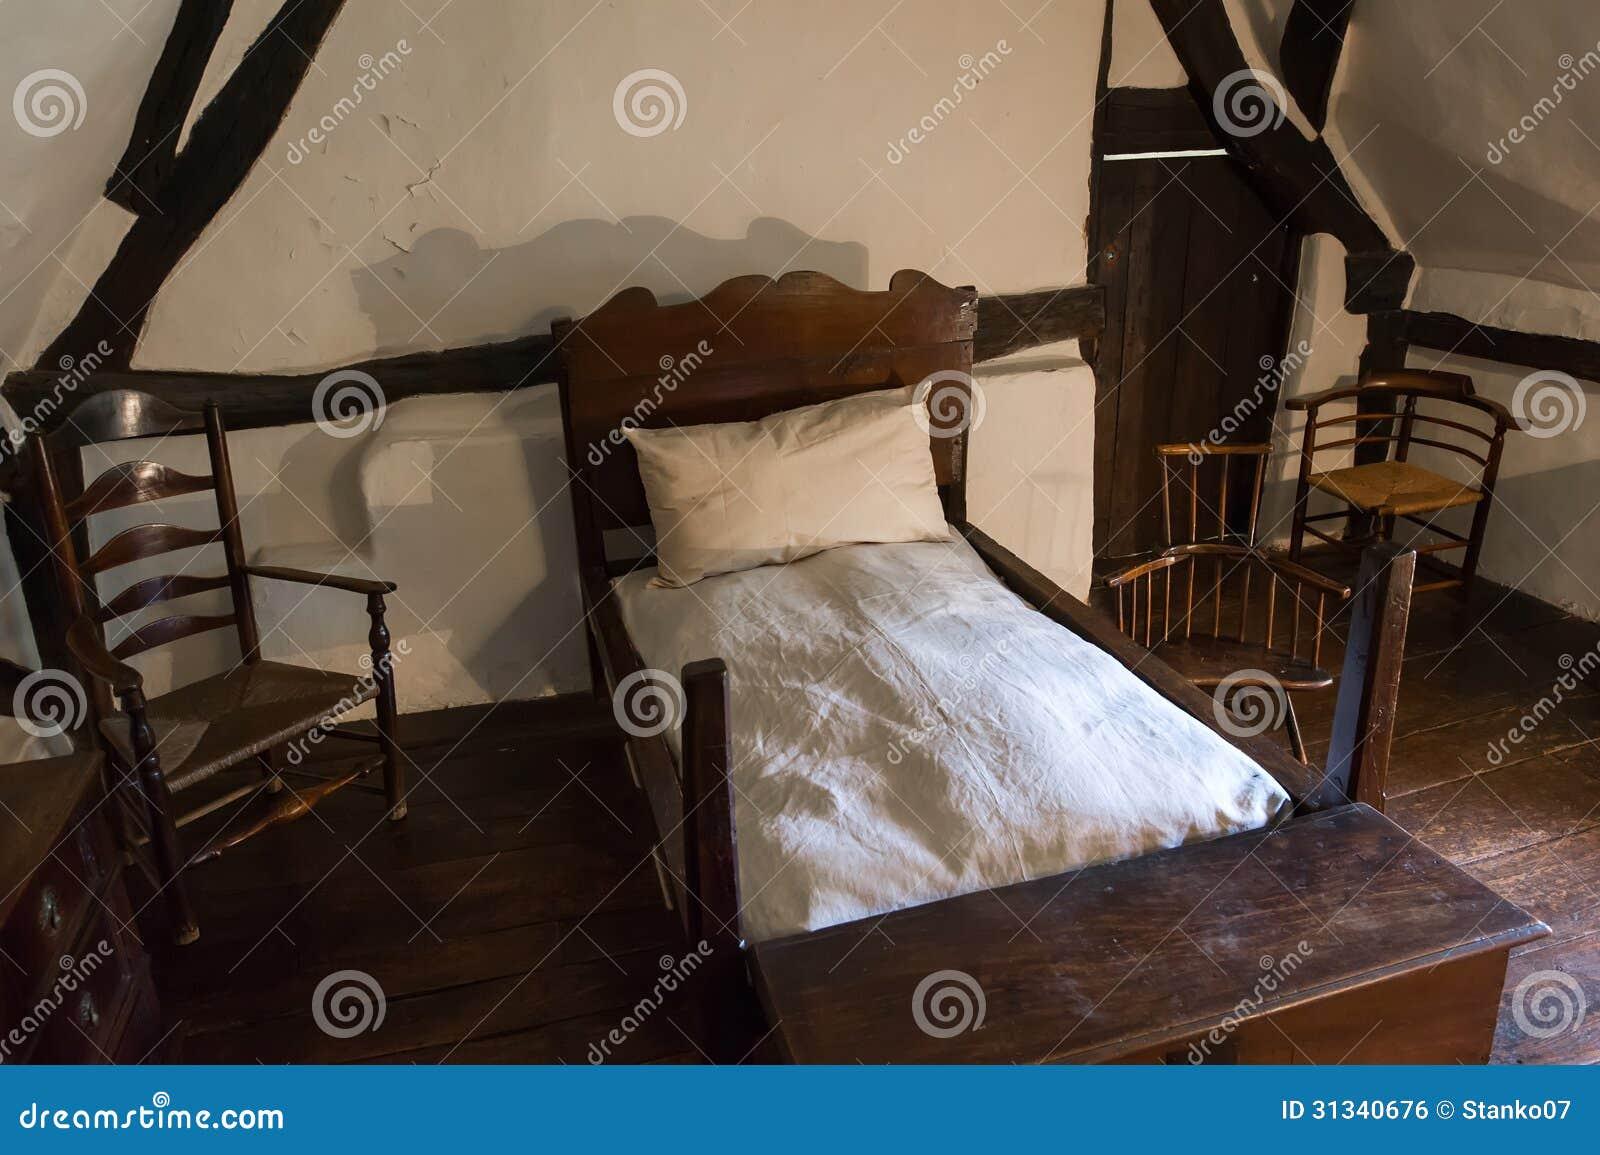 Medieval Bedroom Medieval Rustic Bedroom Royalty Free Stock Image Image 31340676